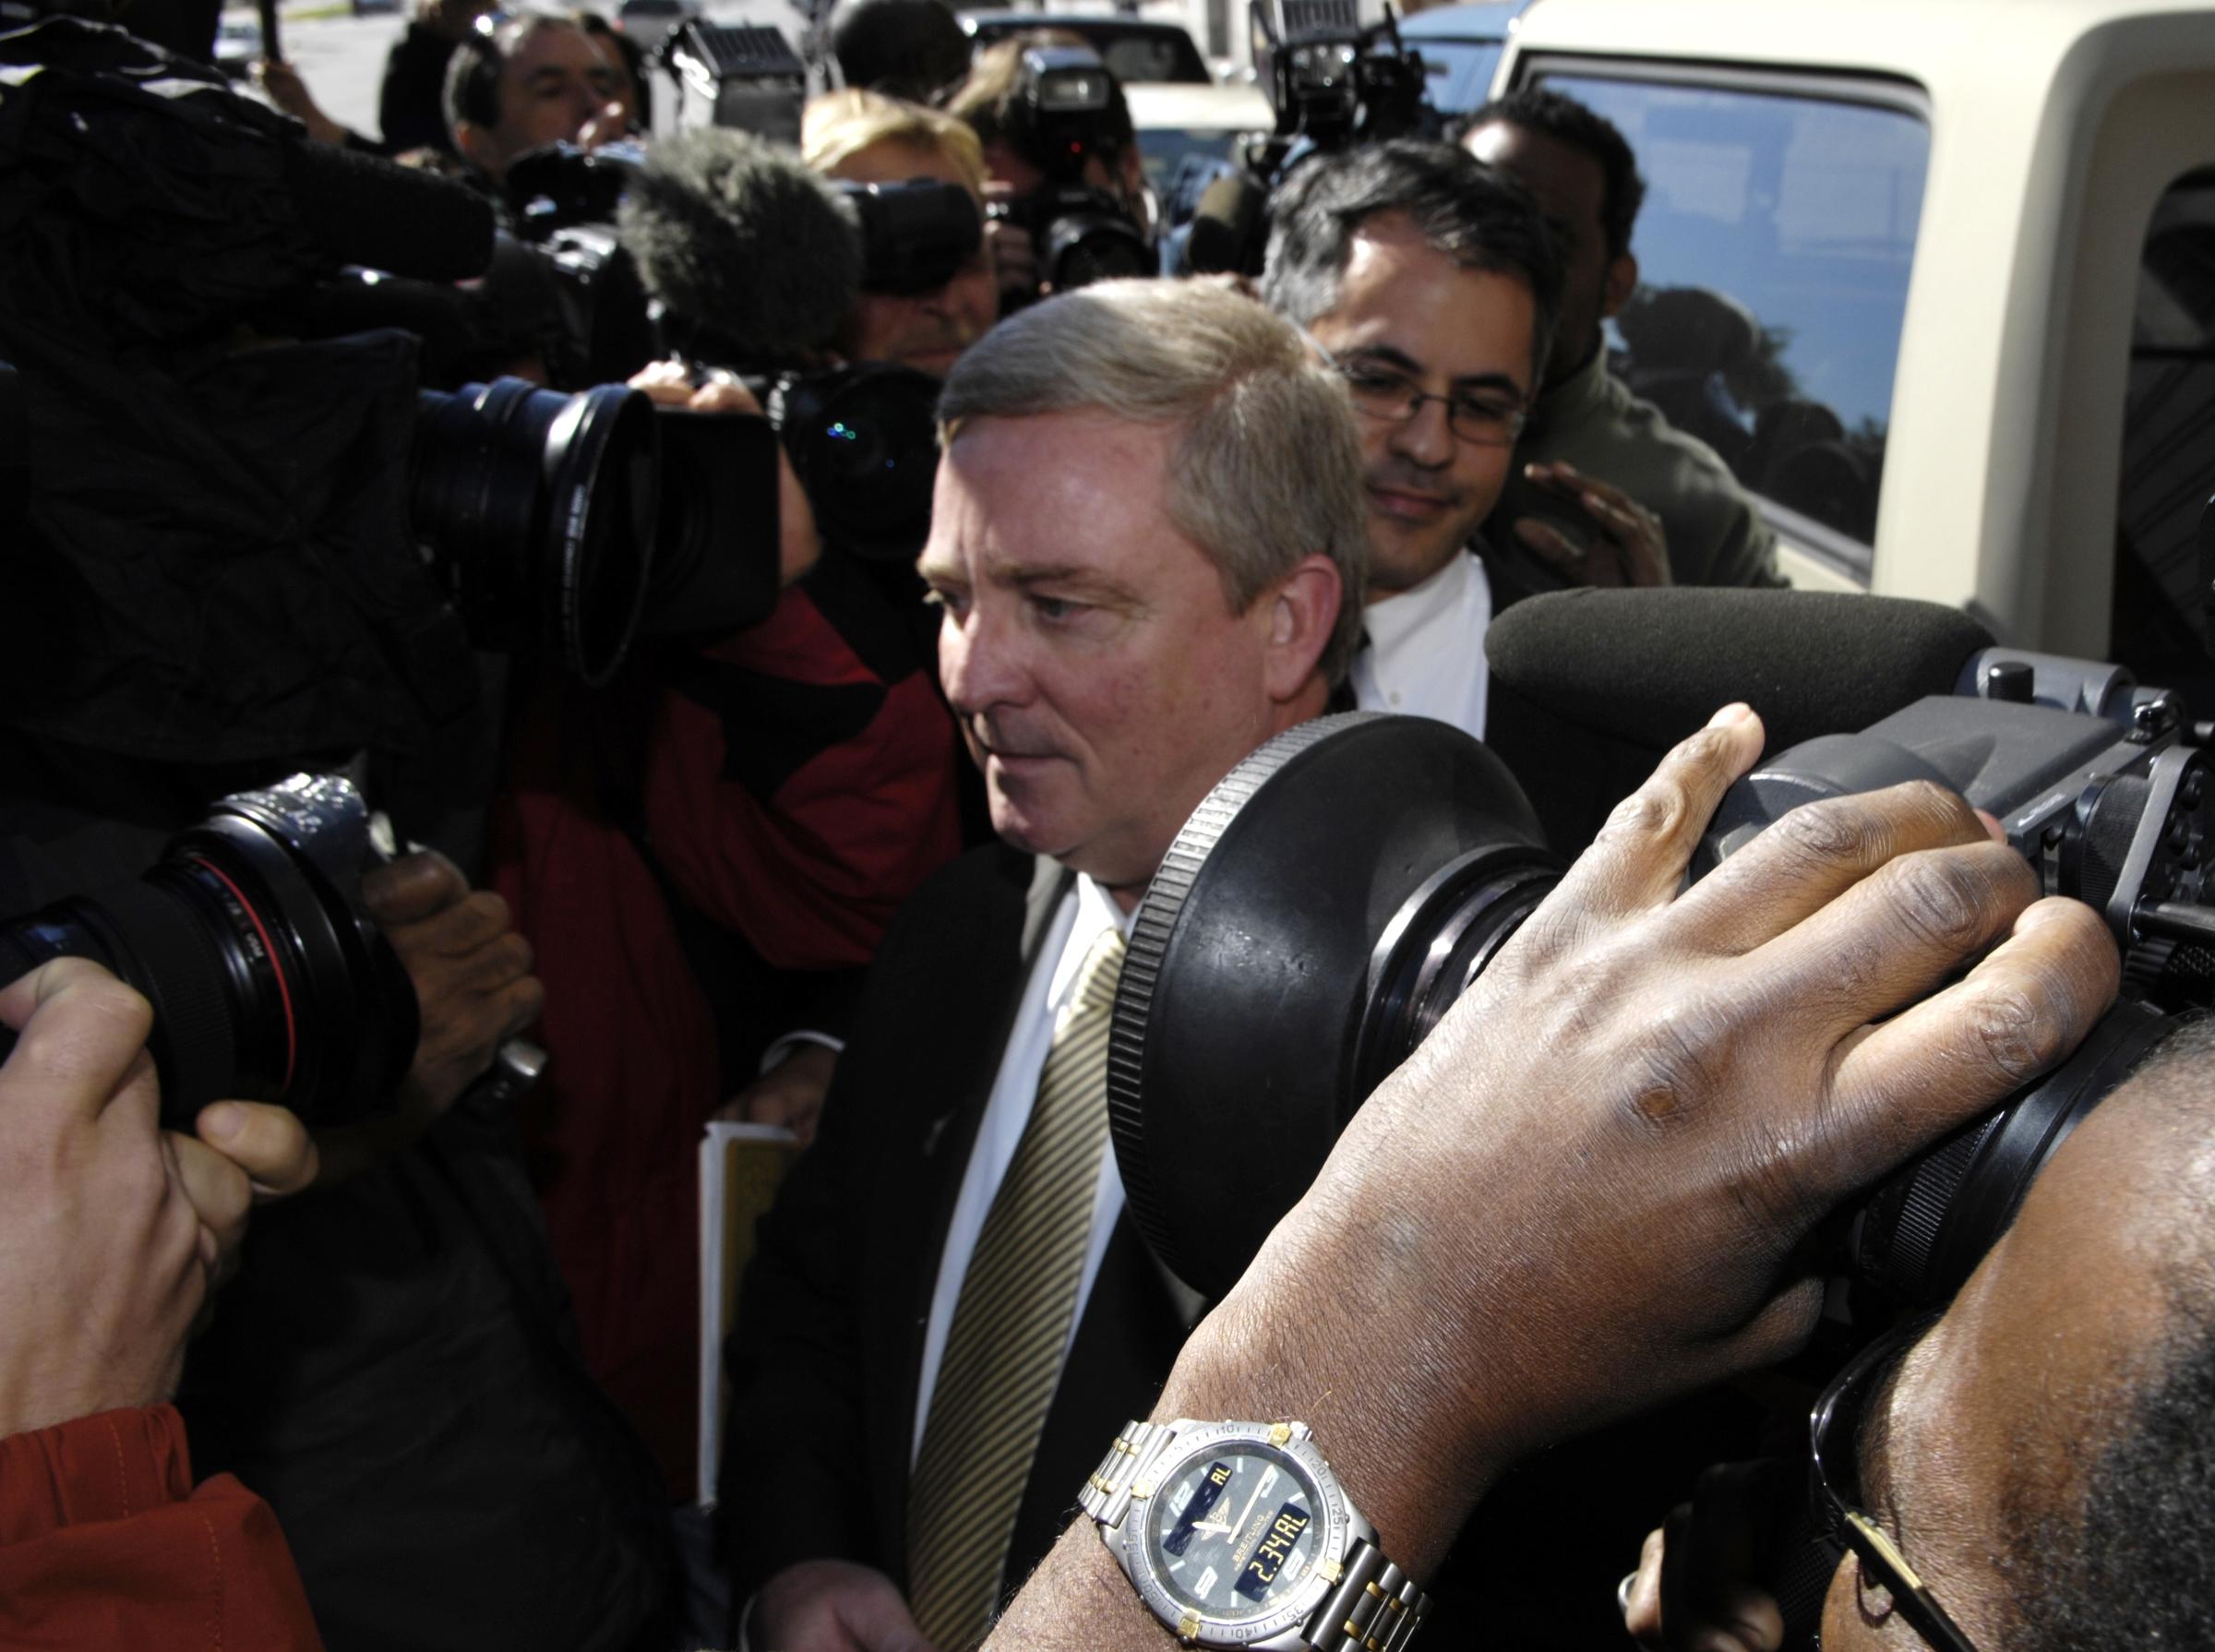 Ohio Rep. Bob Ney sought alcohol abuse treatment. (Photo/Roll Call)